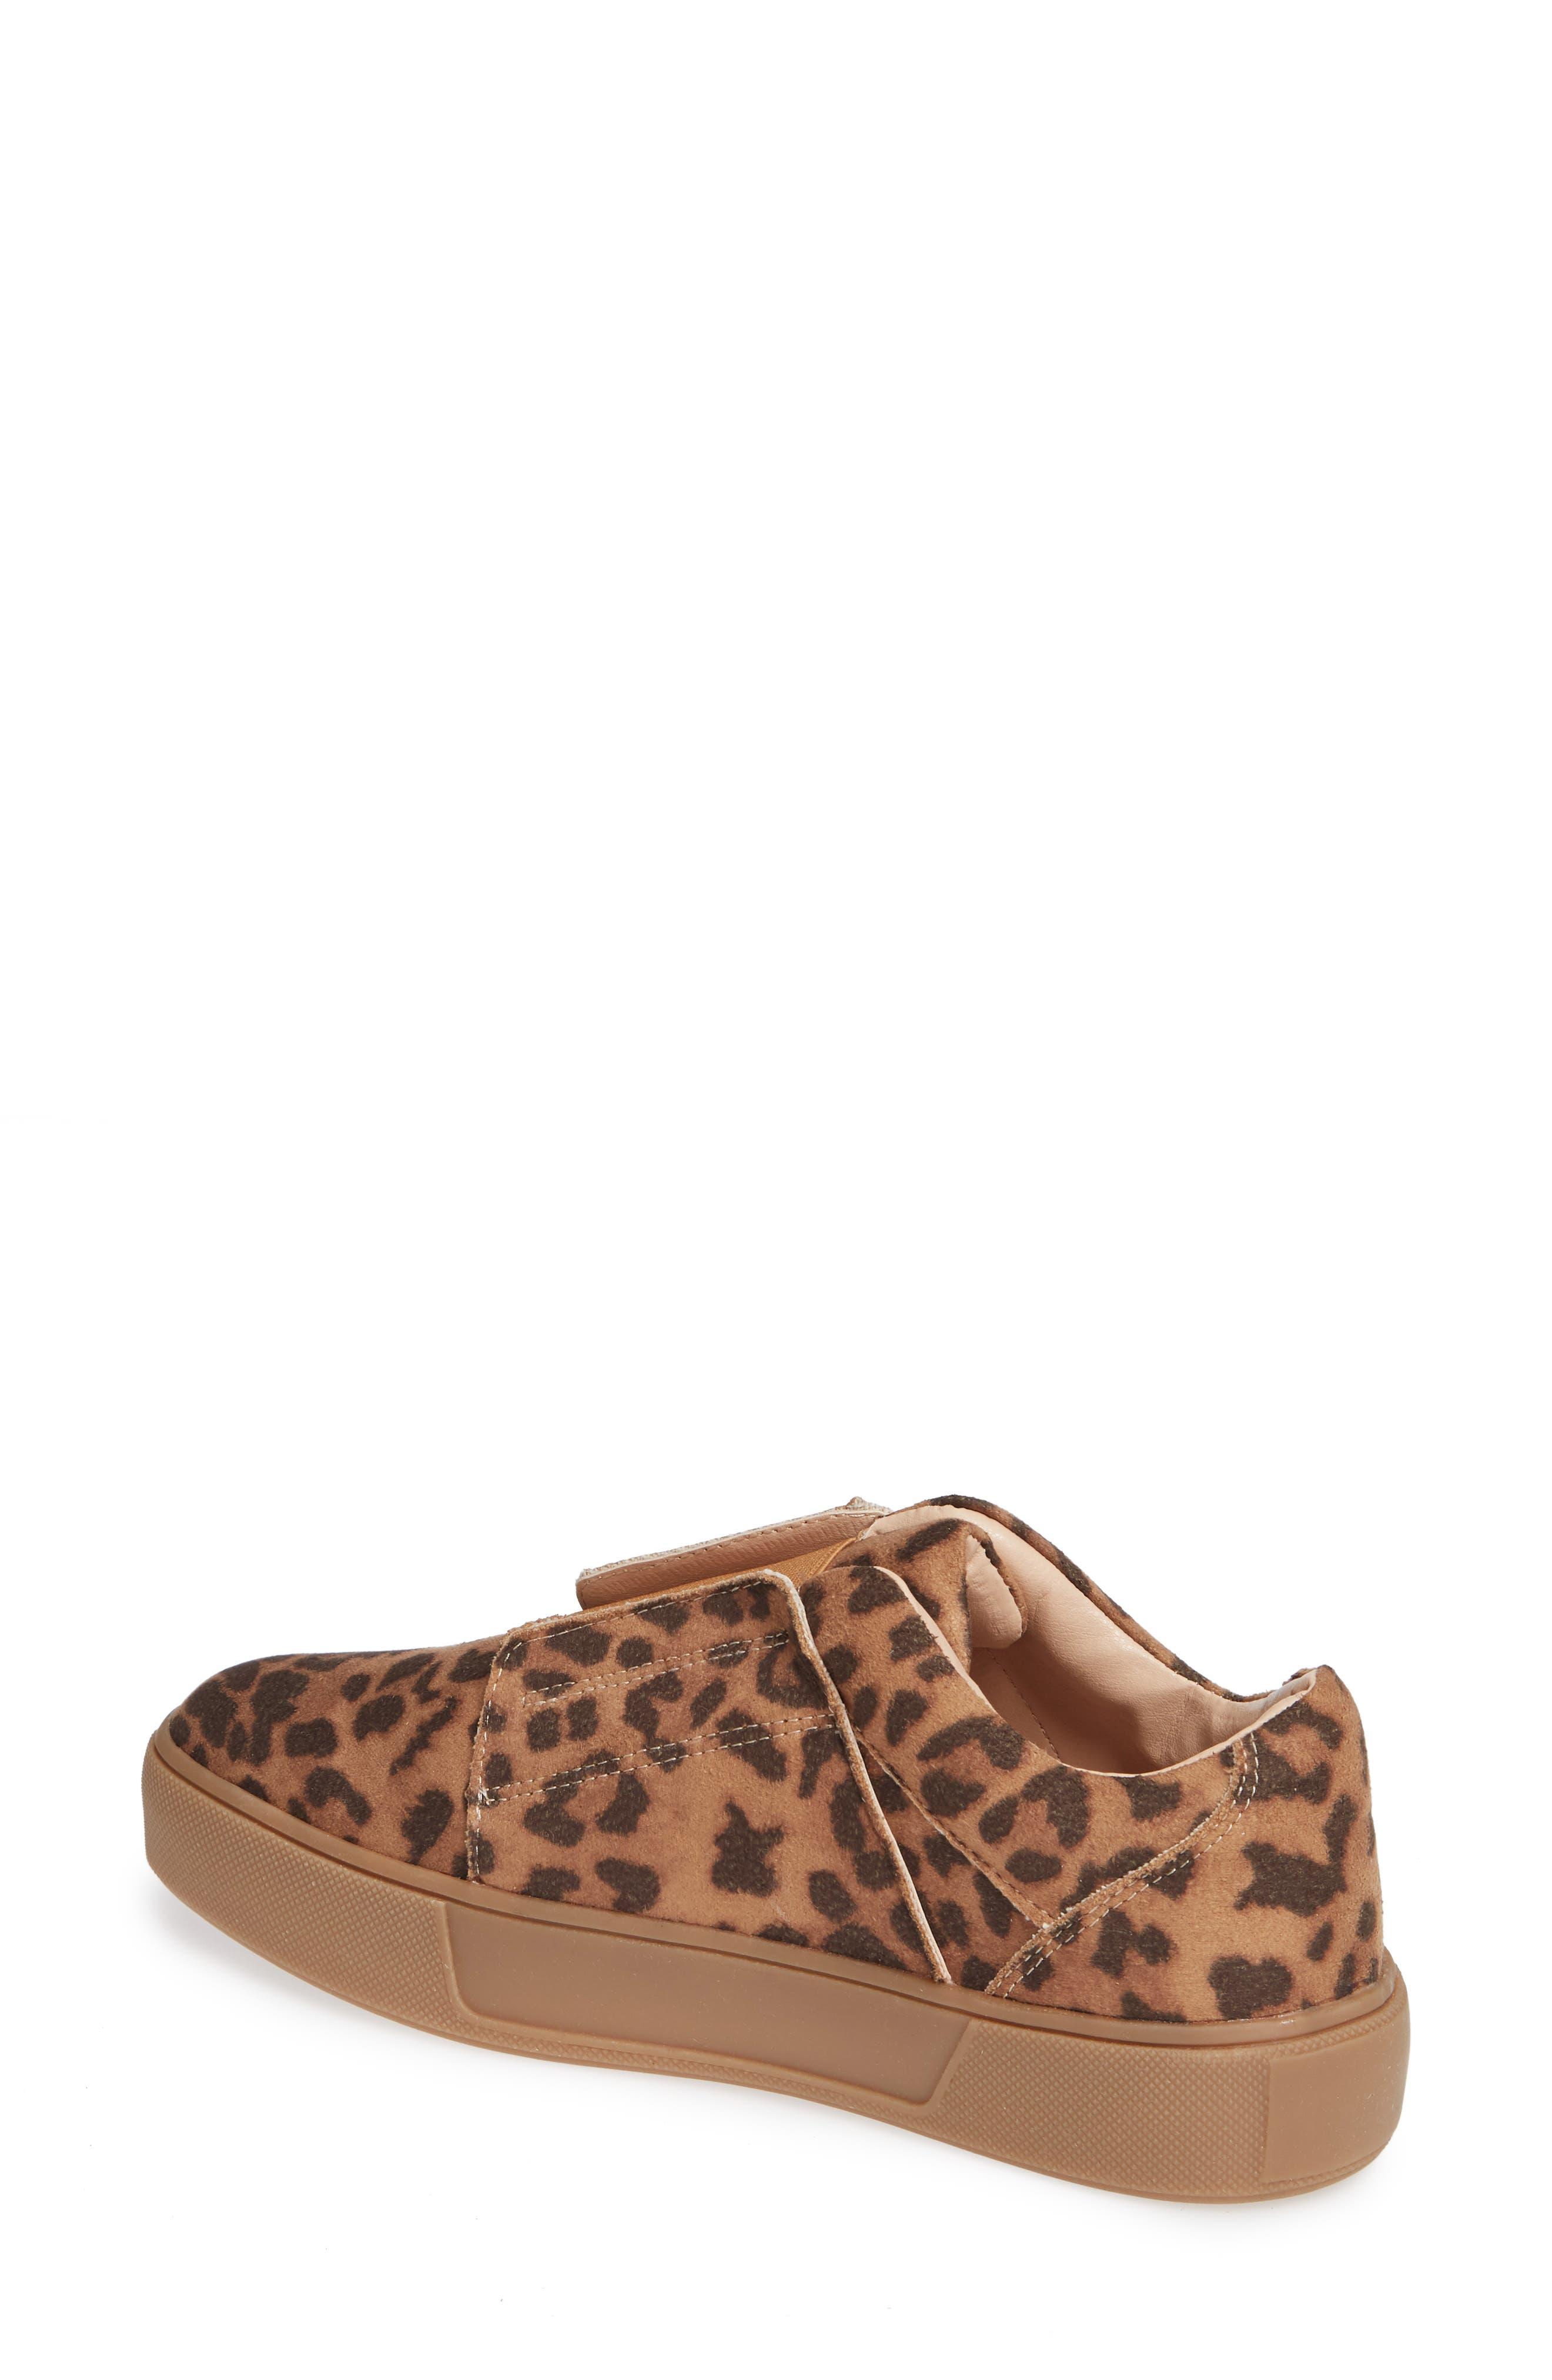 Tamera Slip-On Sneaker,                             Alternate thumbnail 2, color,                             TAN/ LEOPARD MULTI - FABRIC